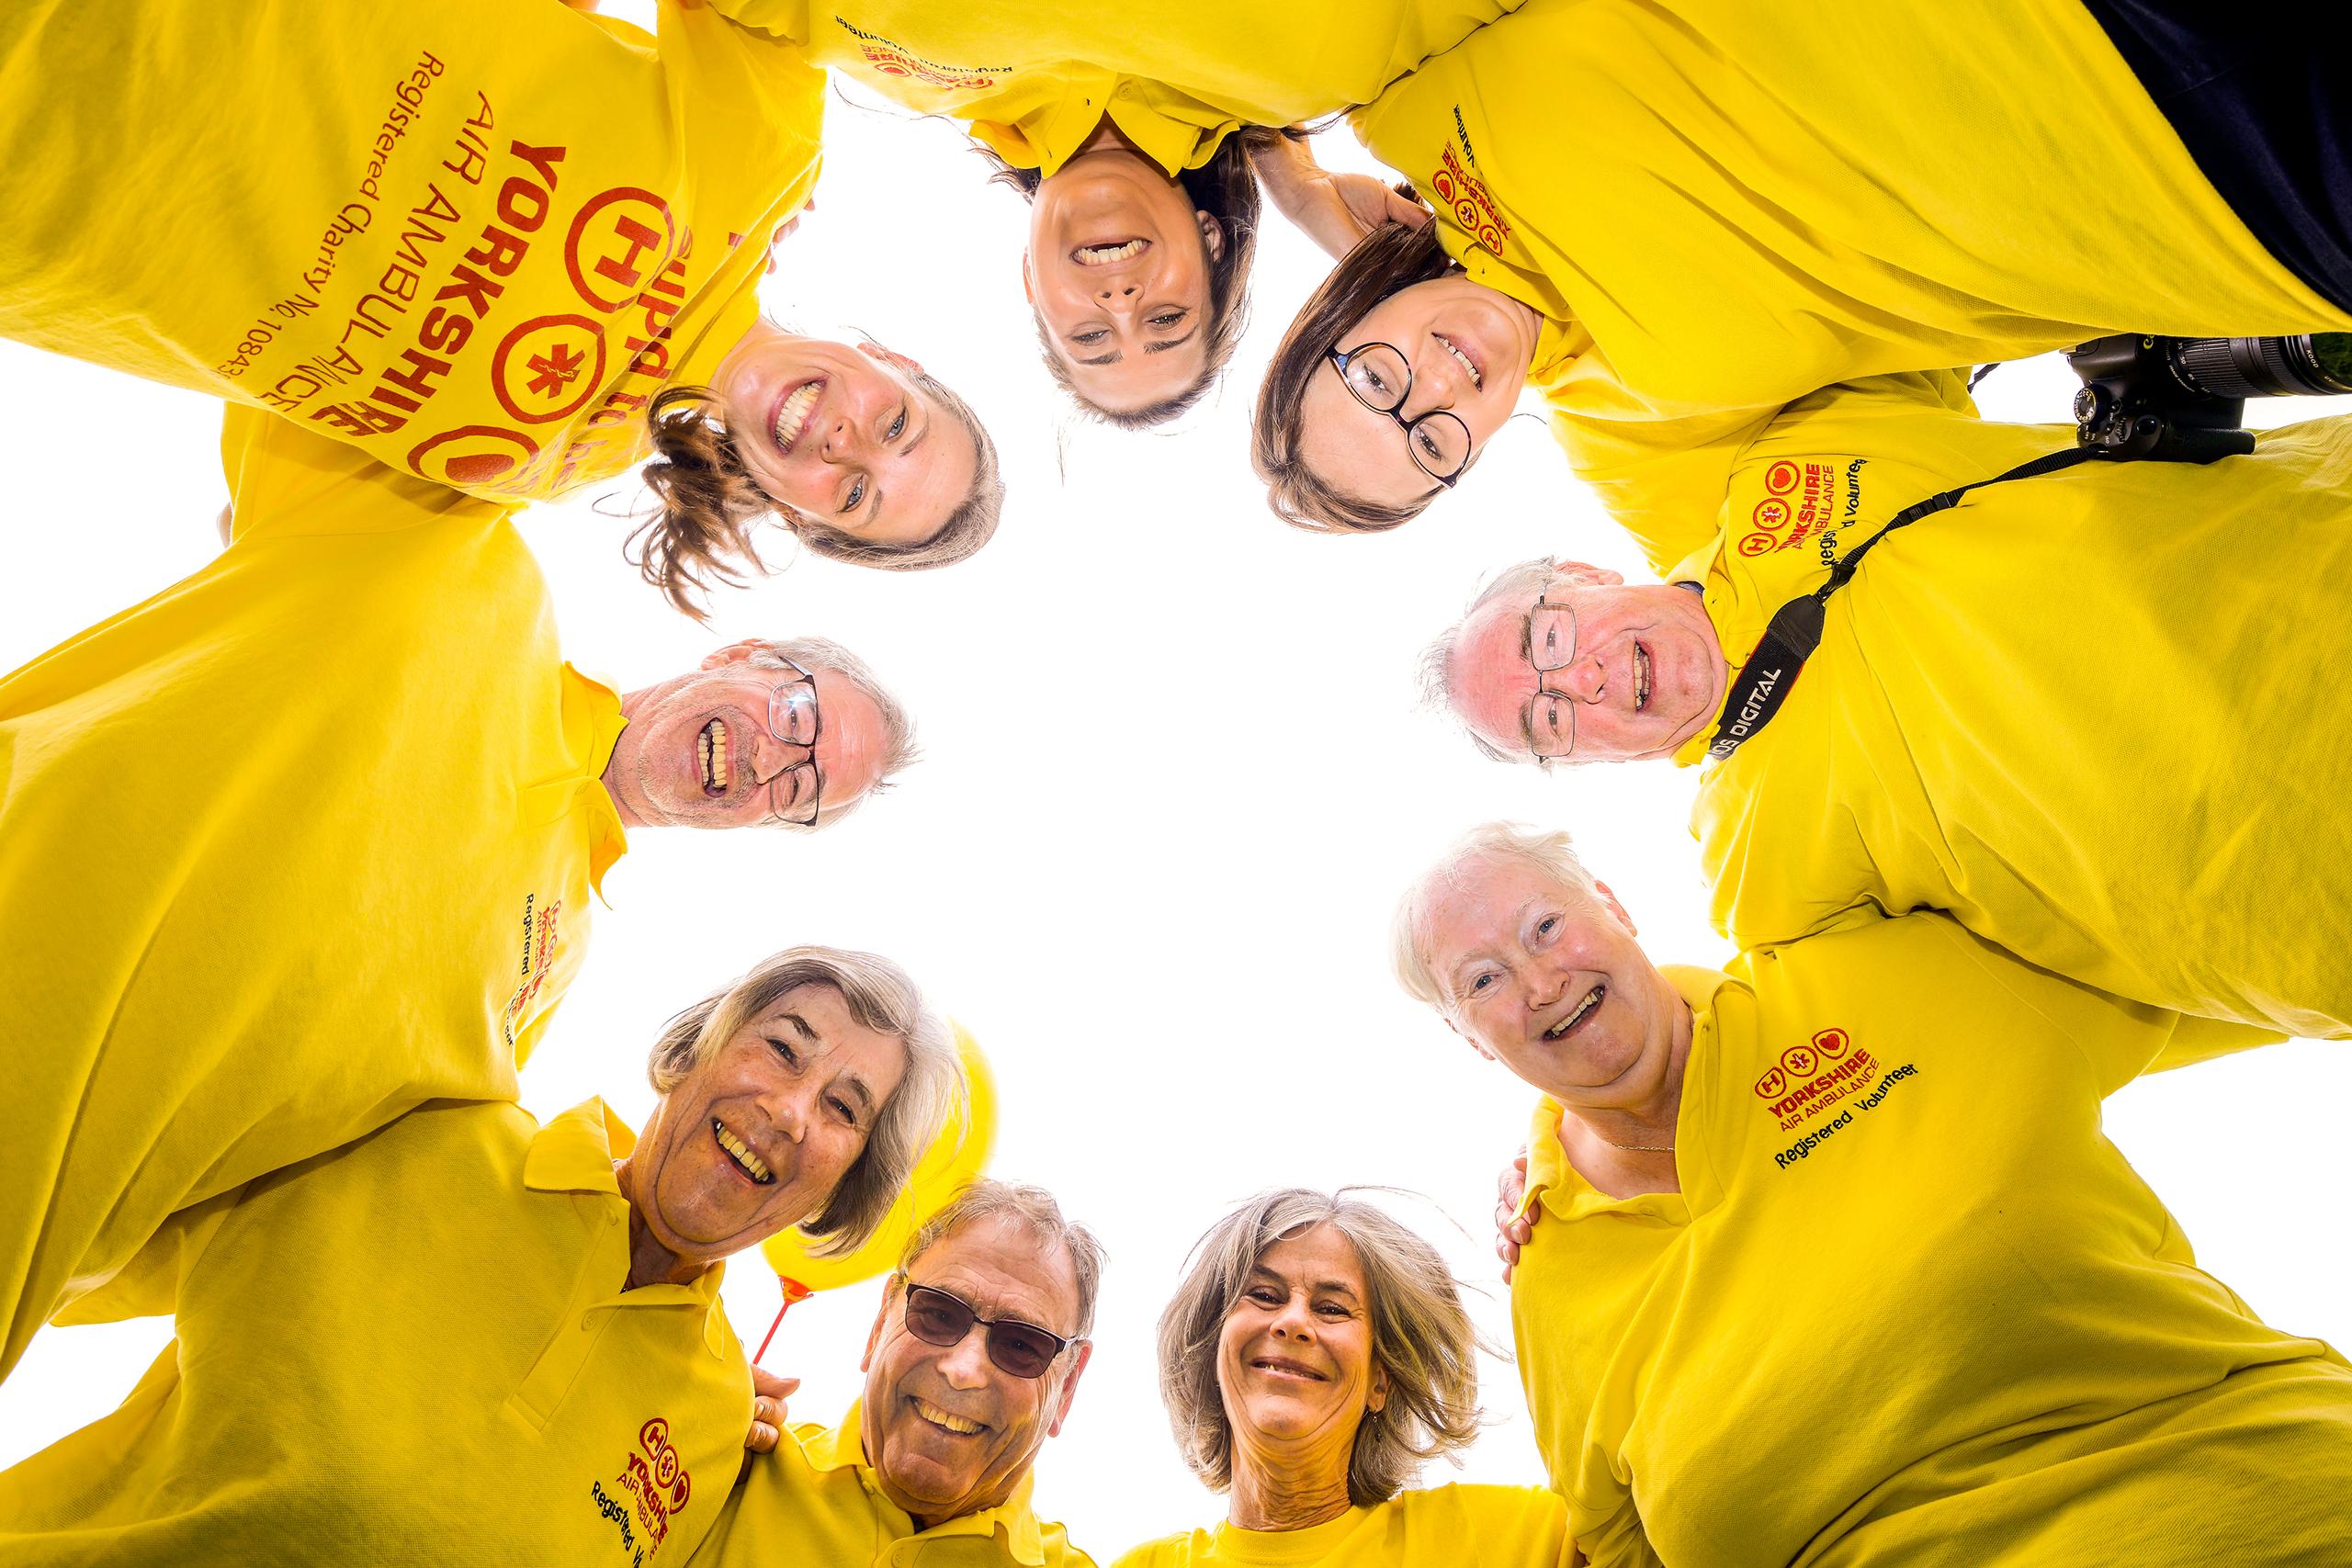 Image Showing YAA Volunteers